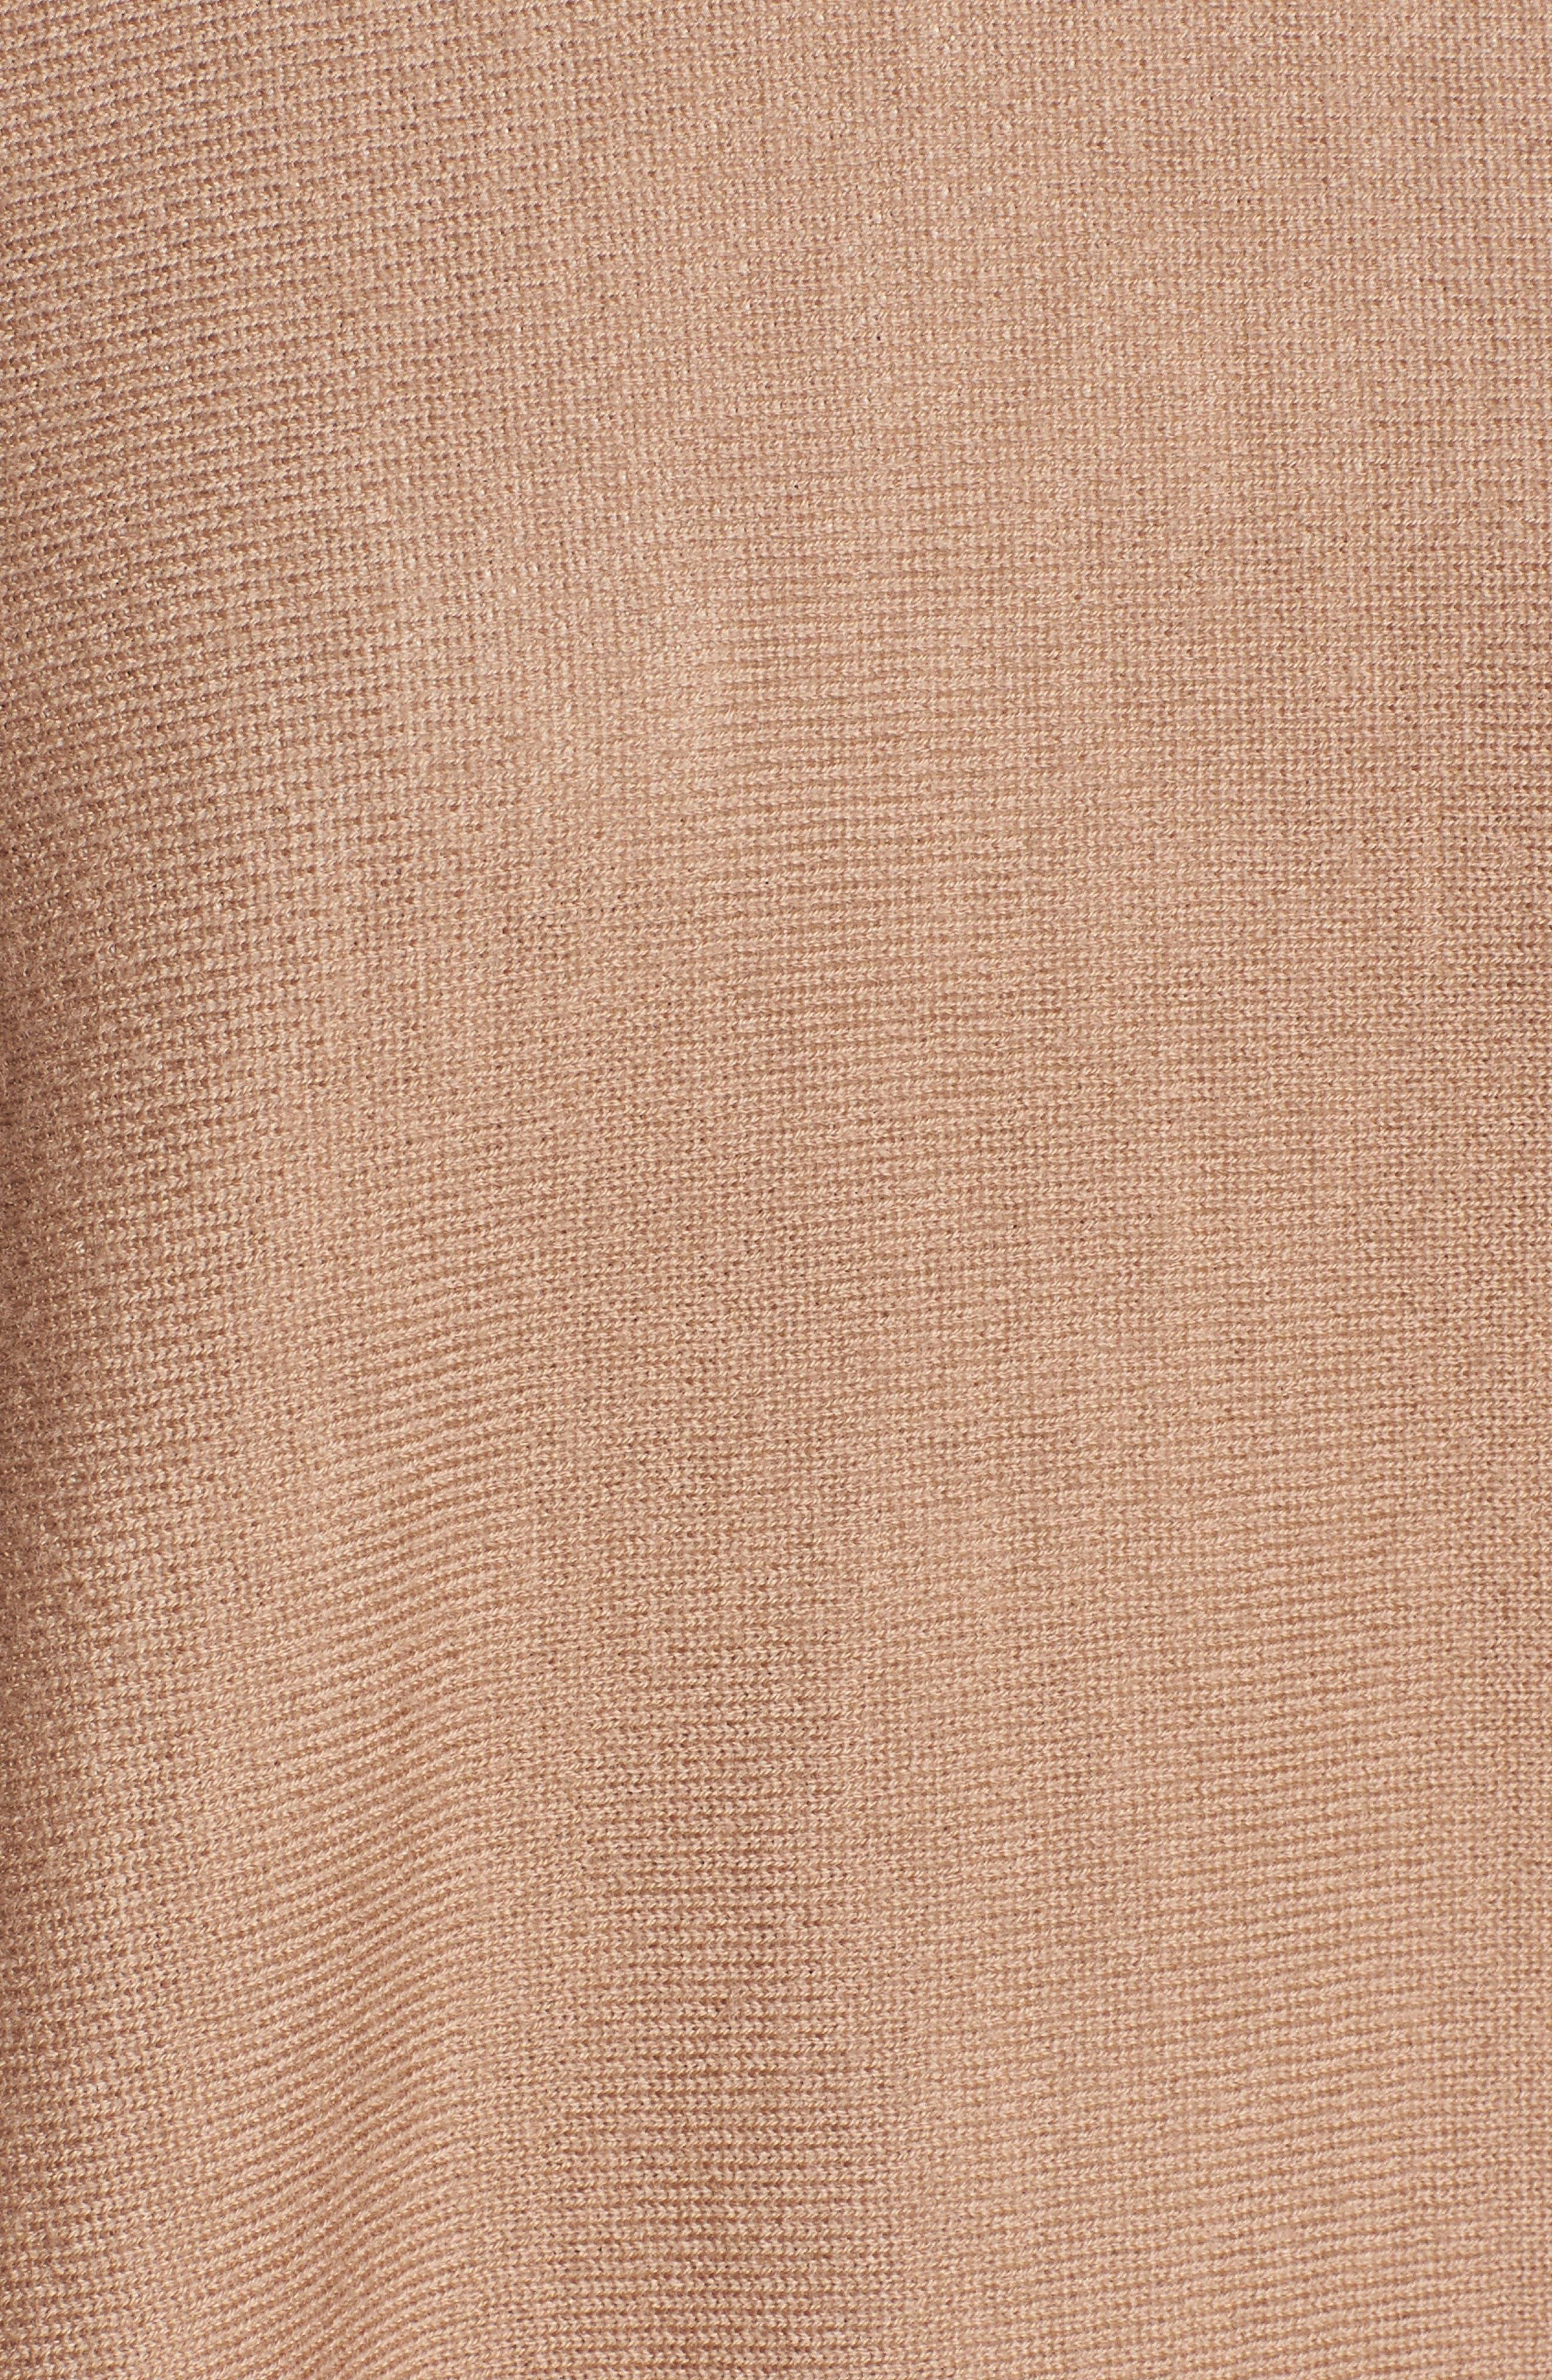 Lilja Wool Poncho,                             Alternate thumbnail 5, color,                             269